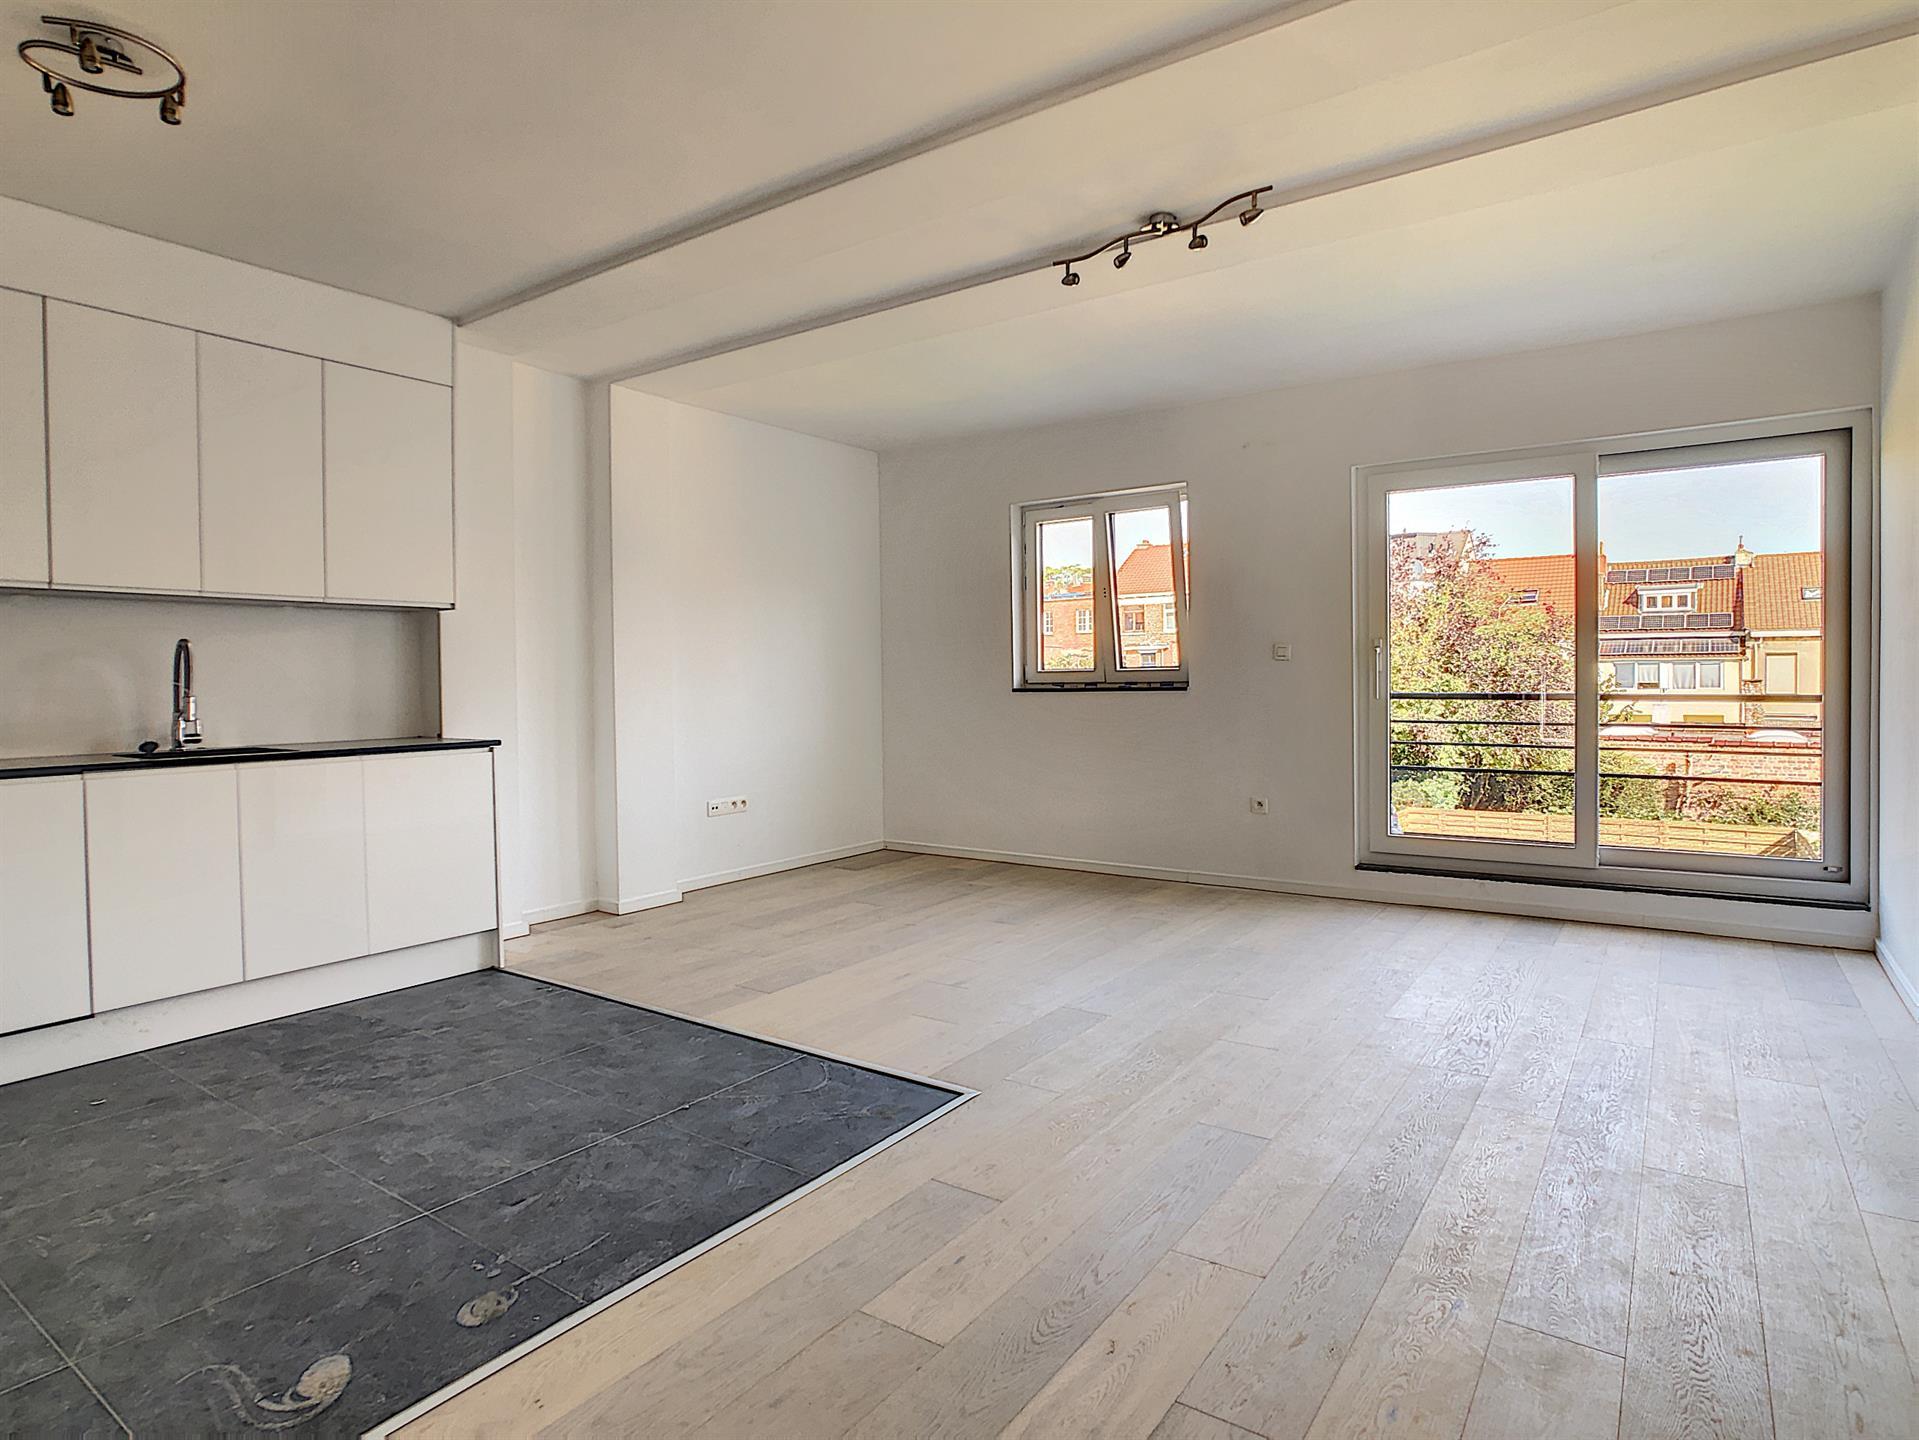 Appartement - Anderlecht - #4252375-2